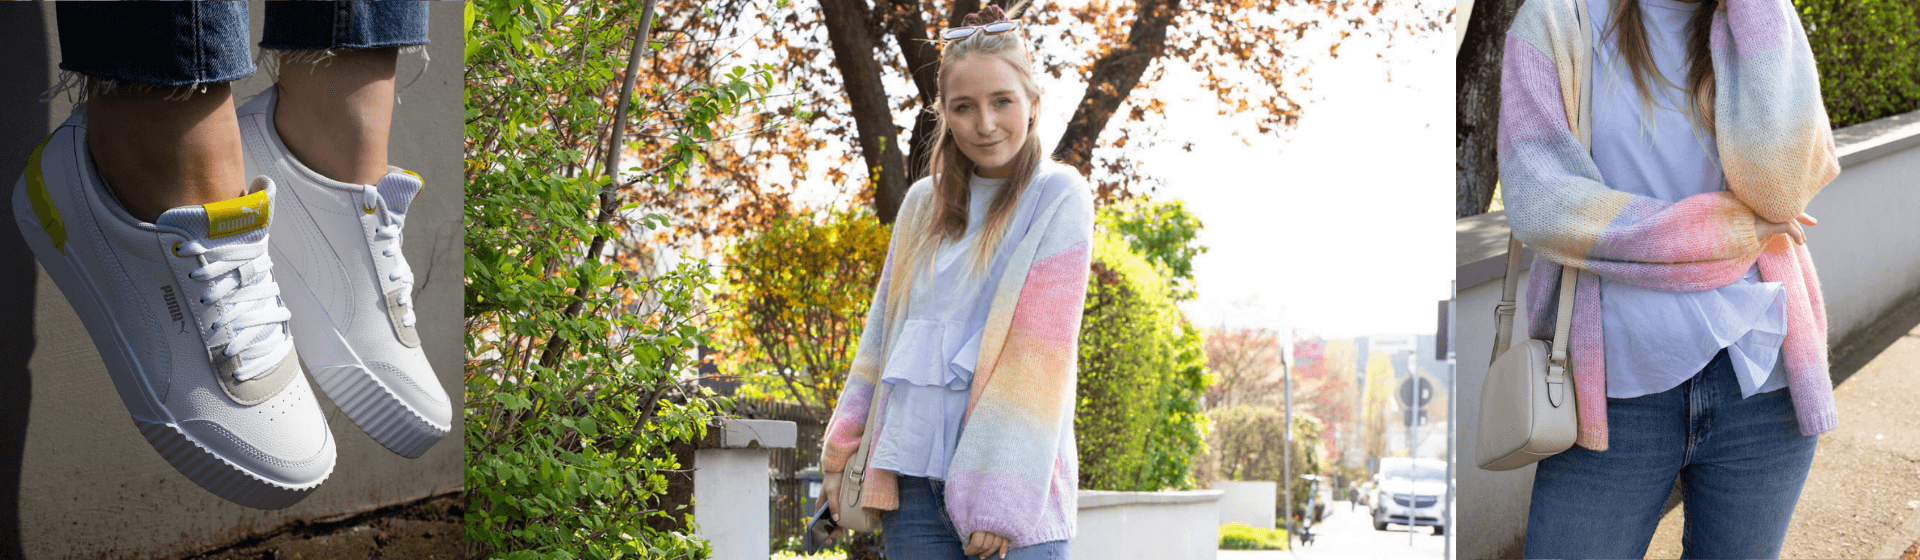 Pastellfarben Outfit Trend